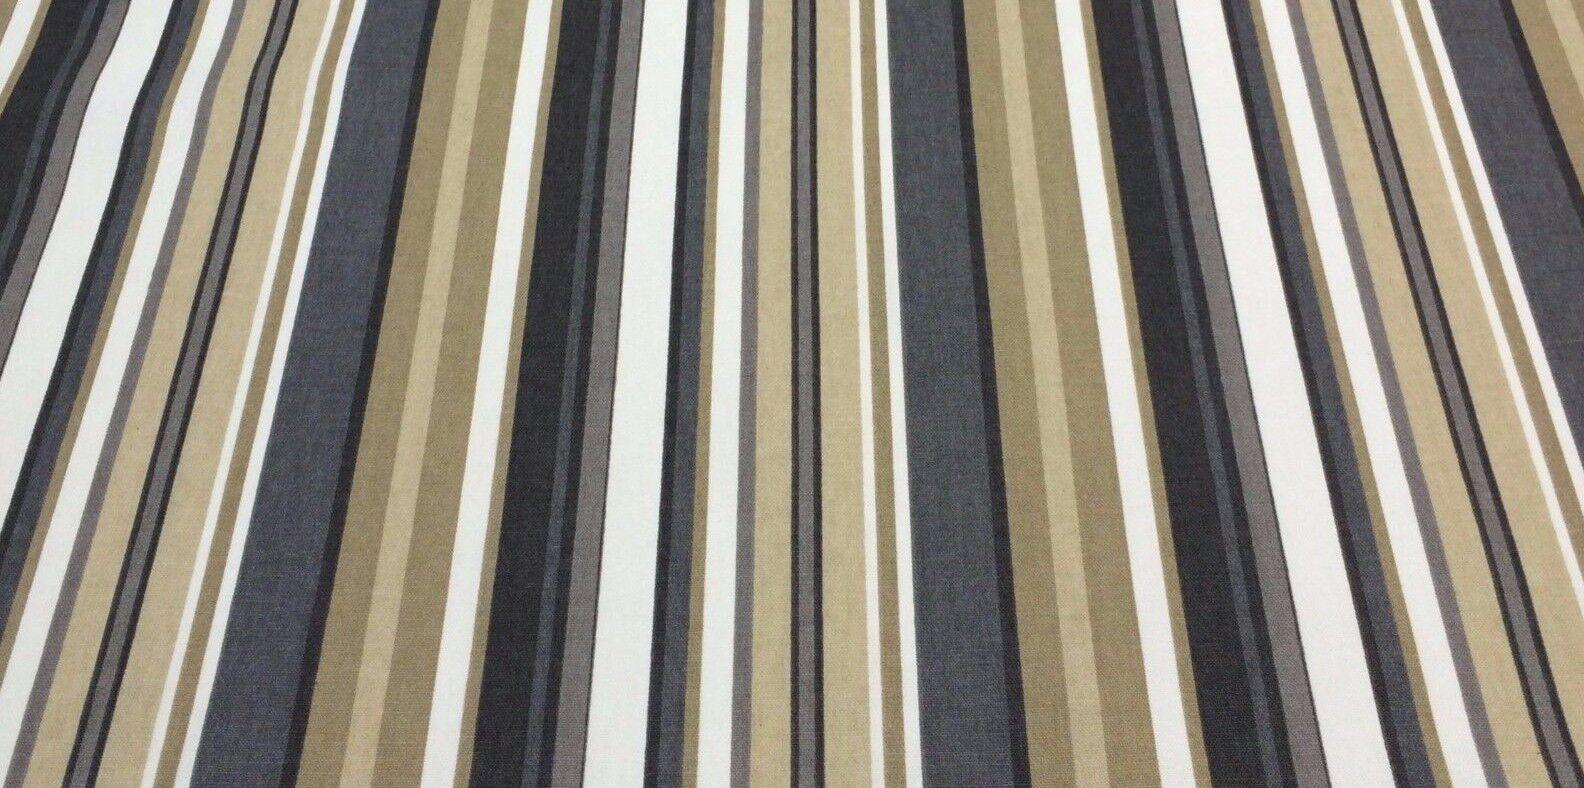 P KAUFMANN PATIO STRIPE CHARCOAL Furniture Upholstery Fabric